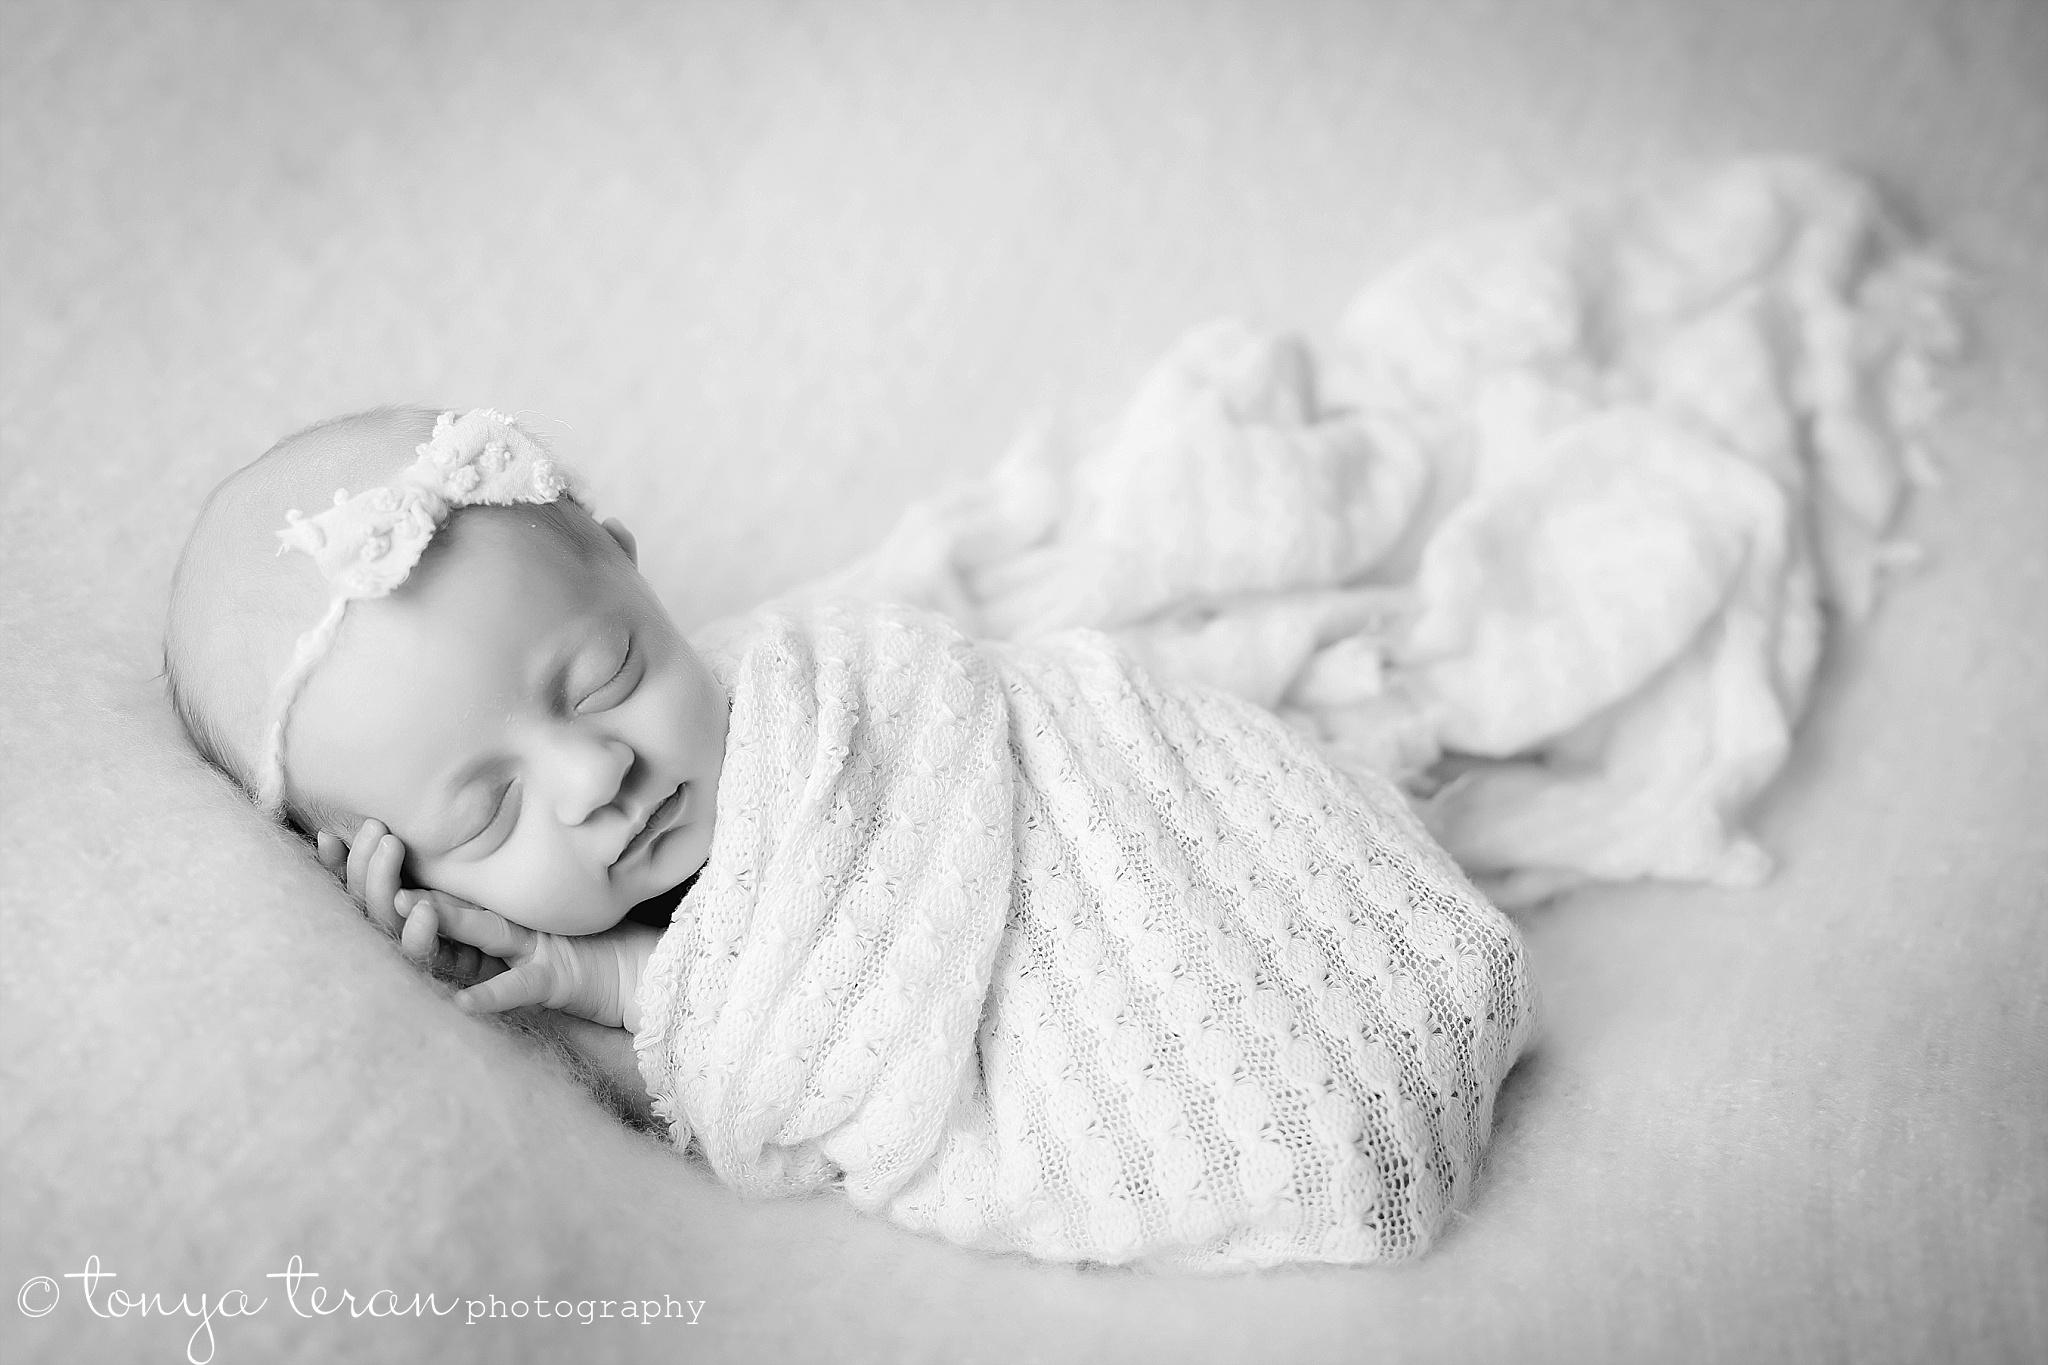 Newborn Photo Session | Tonya Teran Photography, Bethesda, MD Newborn, Baby, and Family Photographer